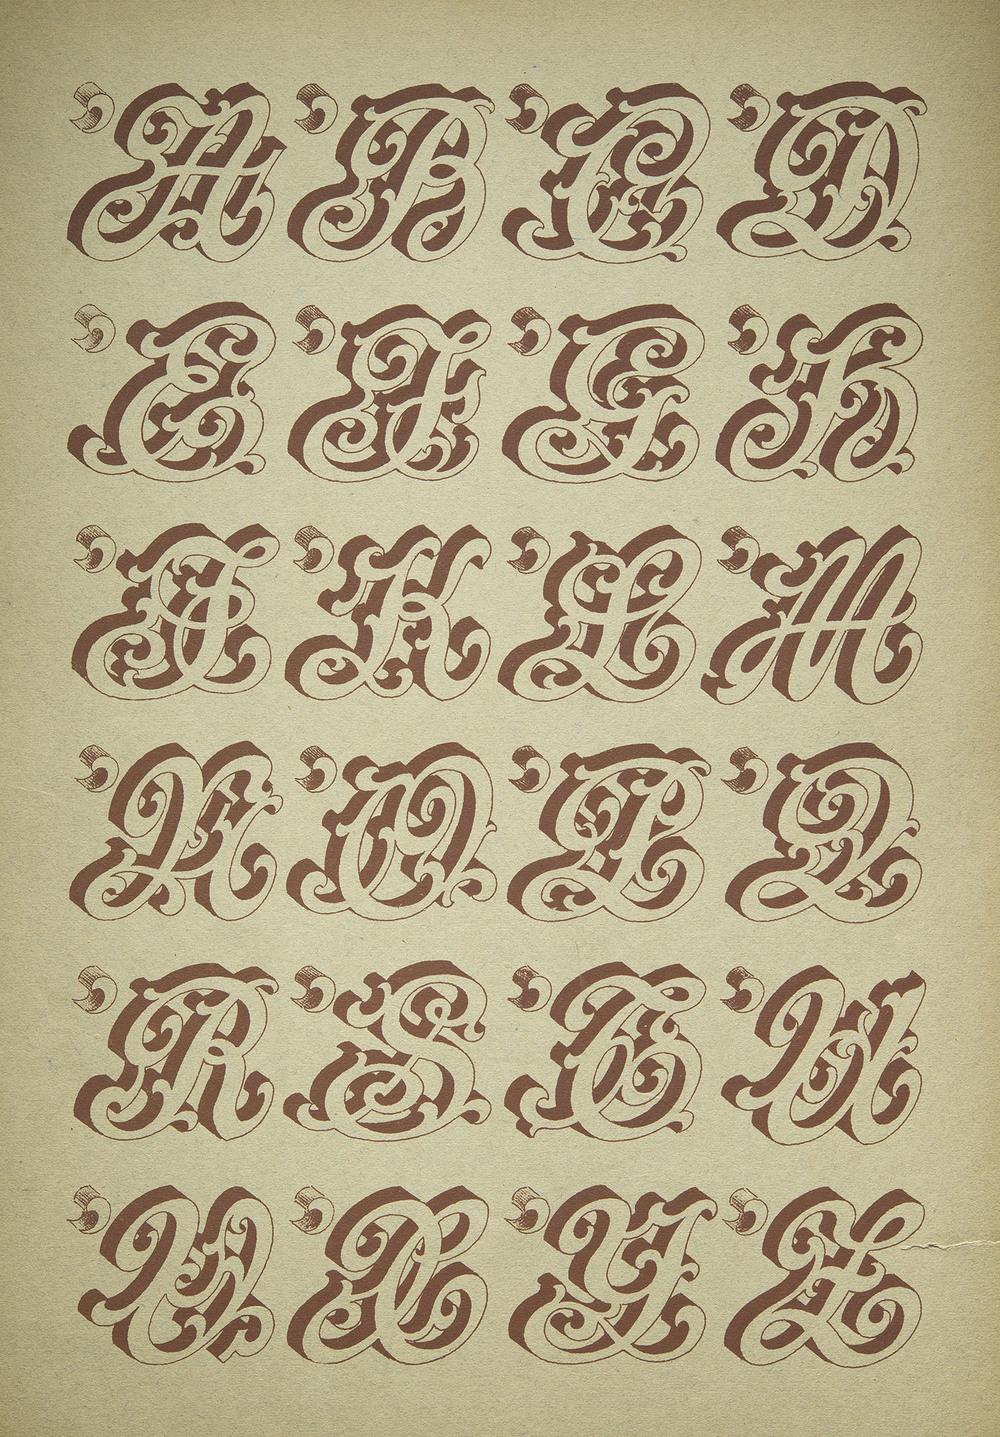 Anonymous French Sign Painter's Alphabet, Paris, nd, 27 x 40 cm